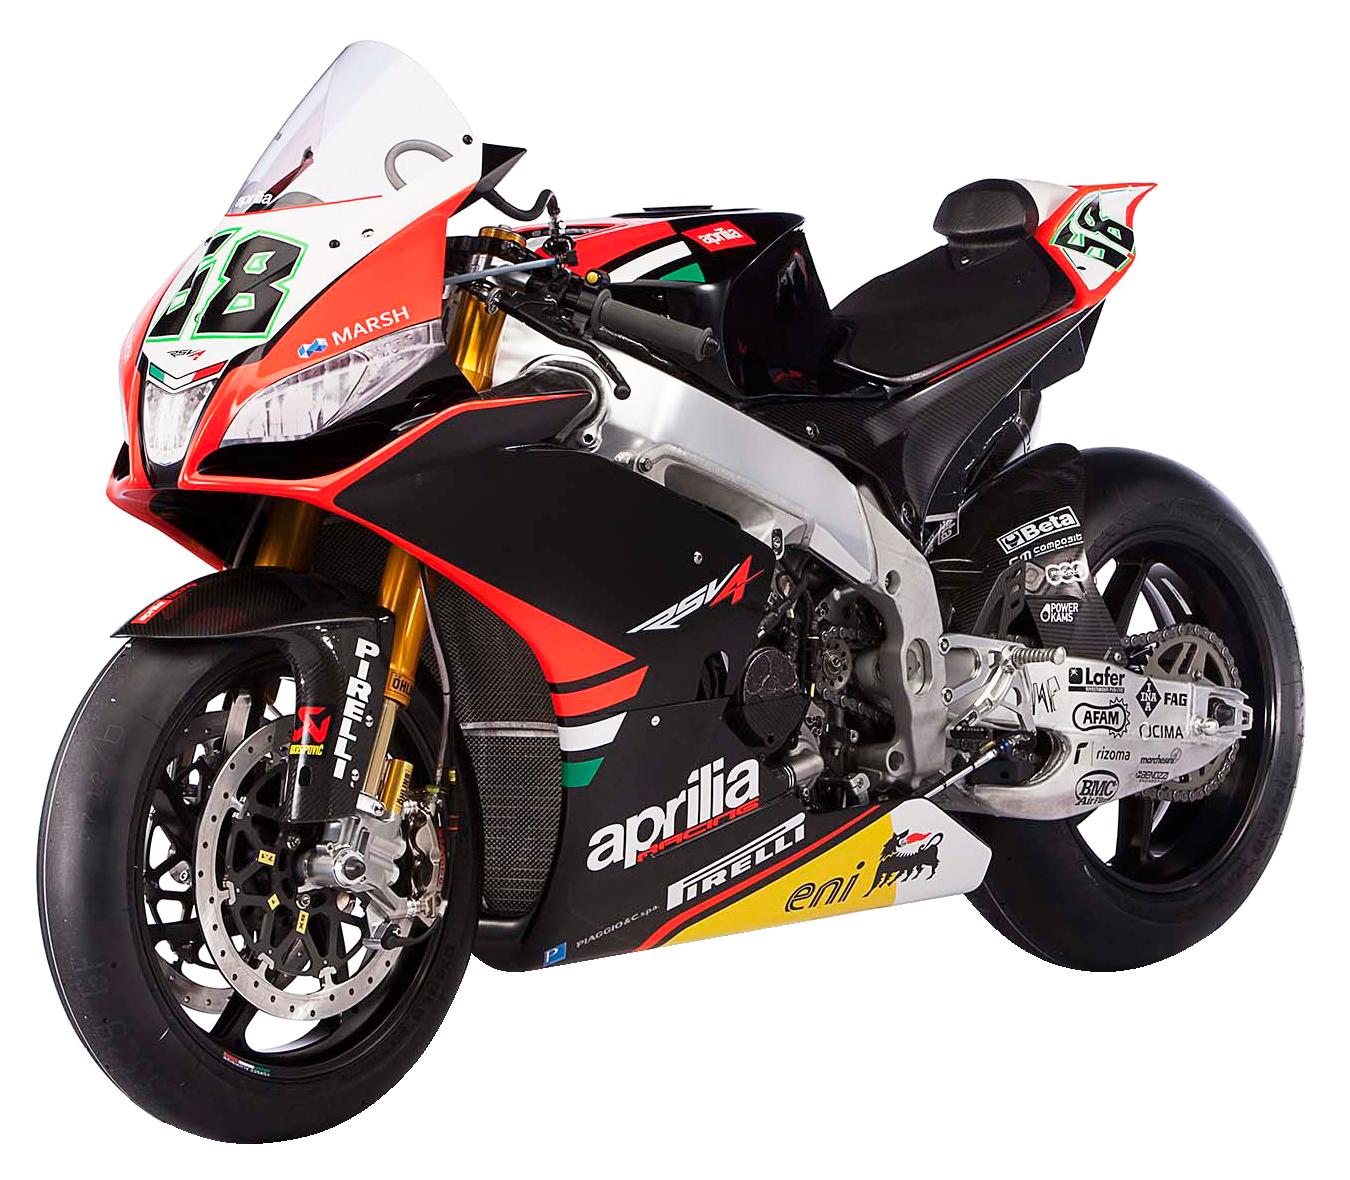 Resolution: 1350 x 1180 | Format: PNG | Keywords: Motorcycle, Motorbike,  Bike, Vehicle, Aprilia, Sport Bike - Aprilia Sport Logo PNG